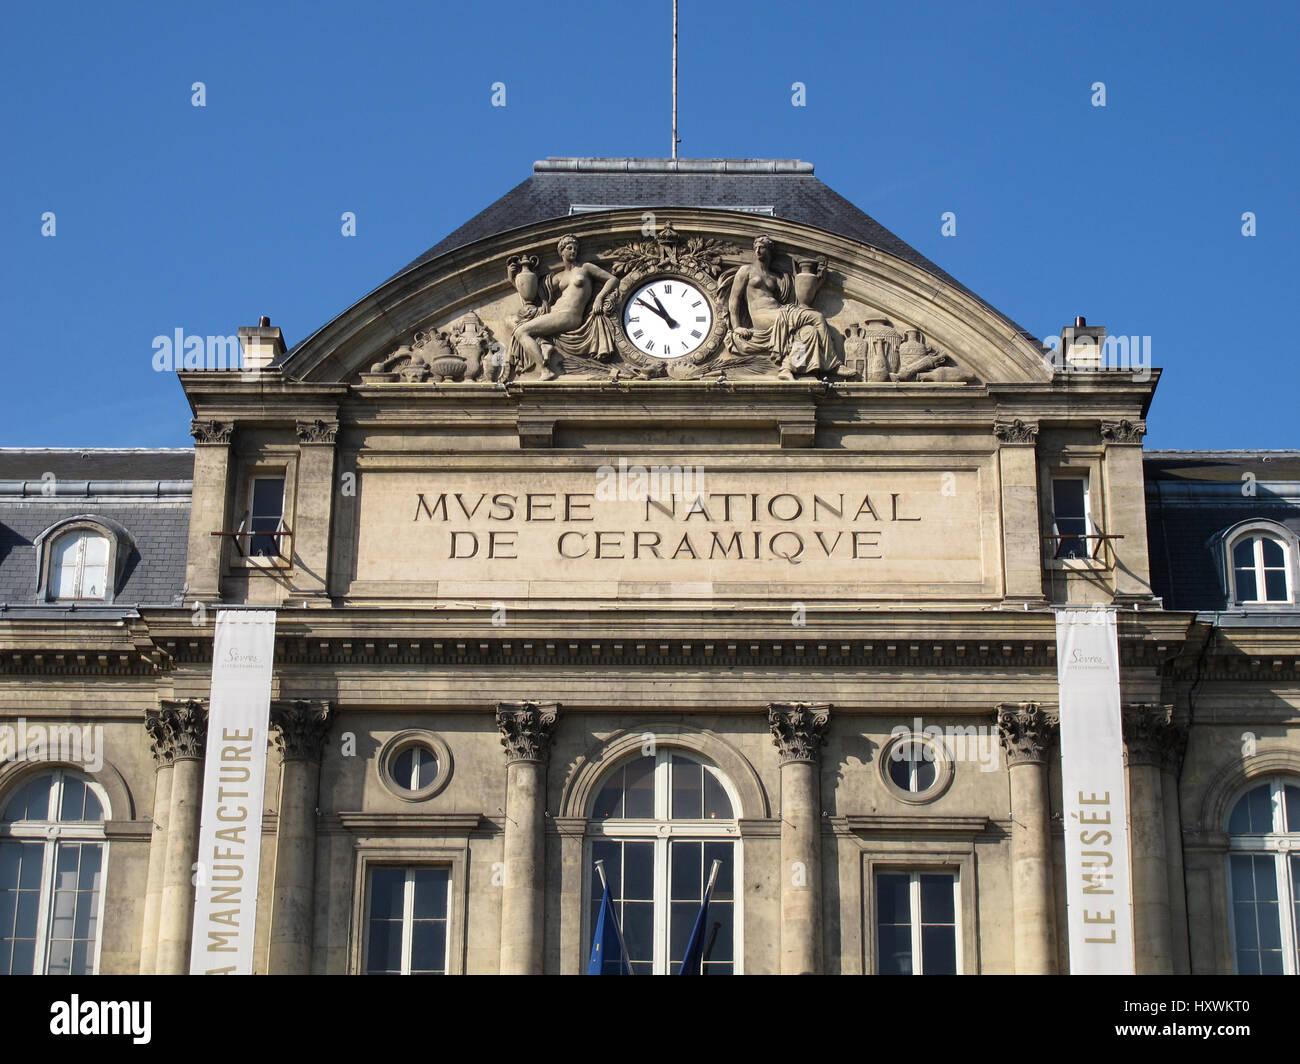 Musee National de Ceramique, National Museum of Ceramics, Bernard Palissy statue, Sevres, Hauts-de-Seine, Paris, - Stock Image